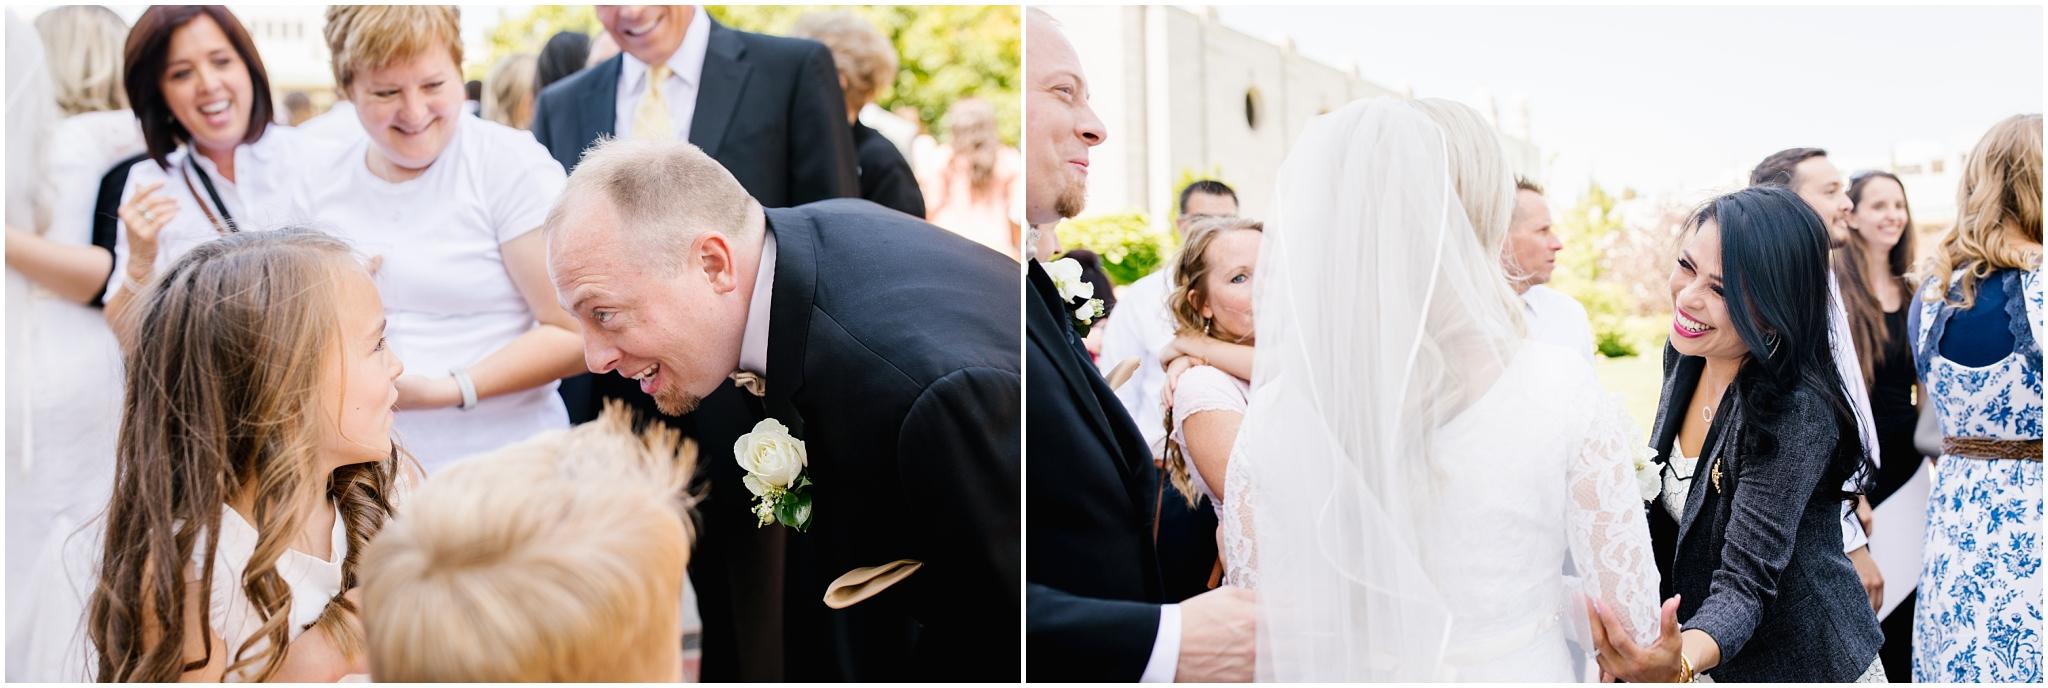 CherylandTyler-25_Lizzie-B-Imagery-Utah-Wedding-Photographer-Salt-Lake-City-Temple-Wells-Fargo-Building-Reception.jpg